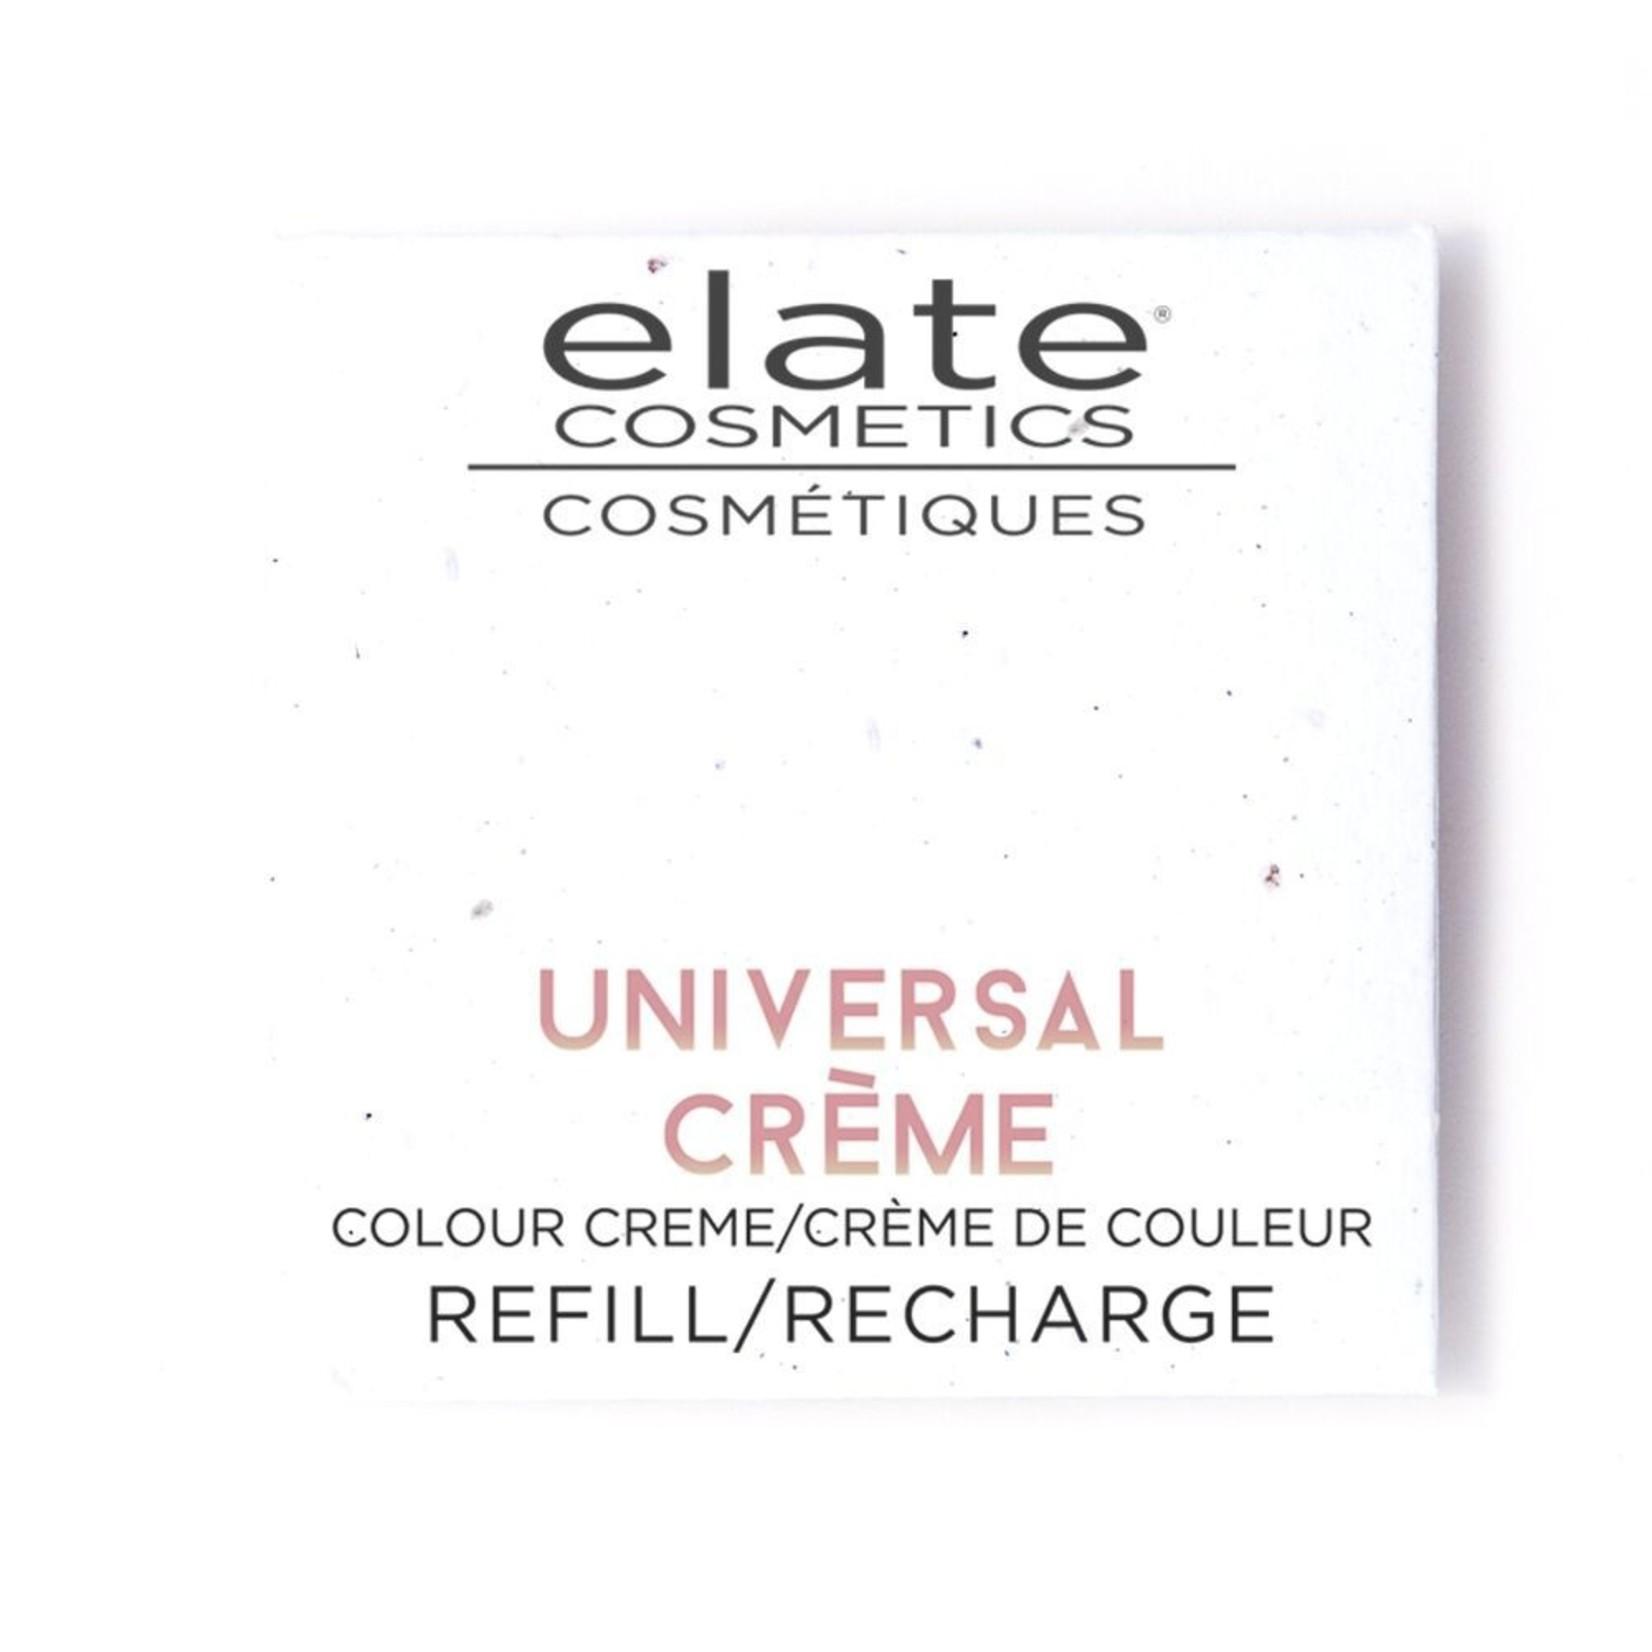 ELATE COSMETICS UNIVERSAL CREME - BLISS